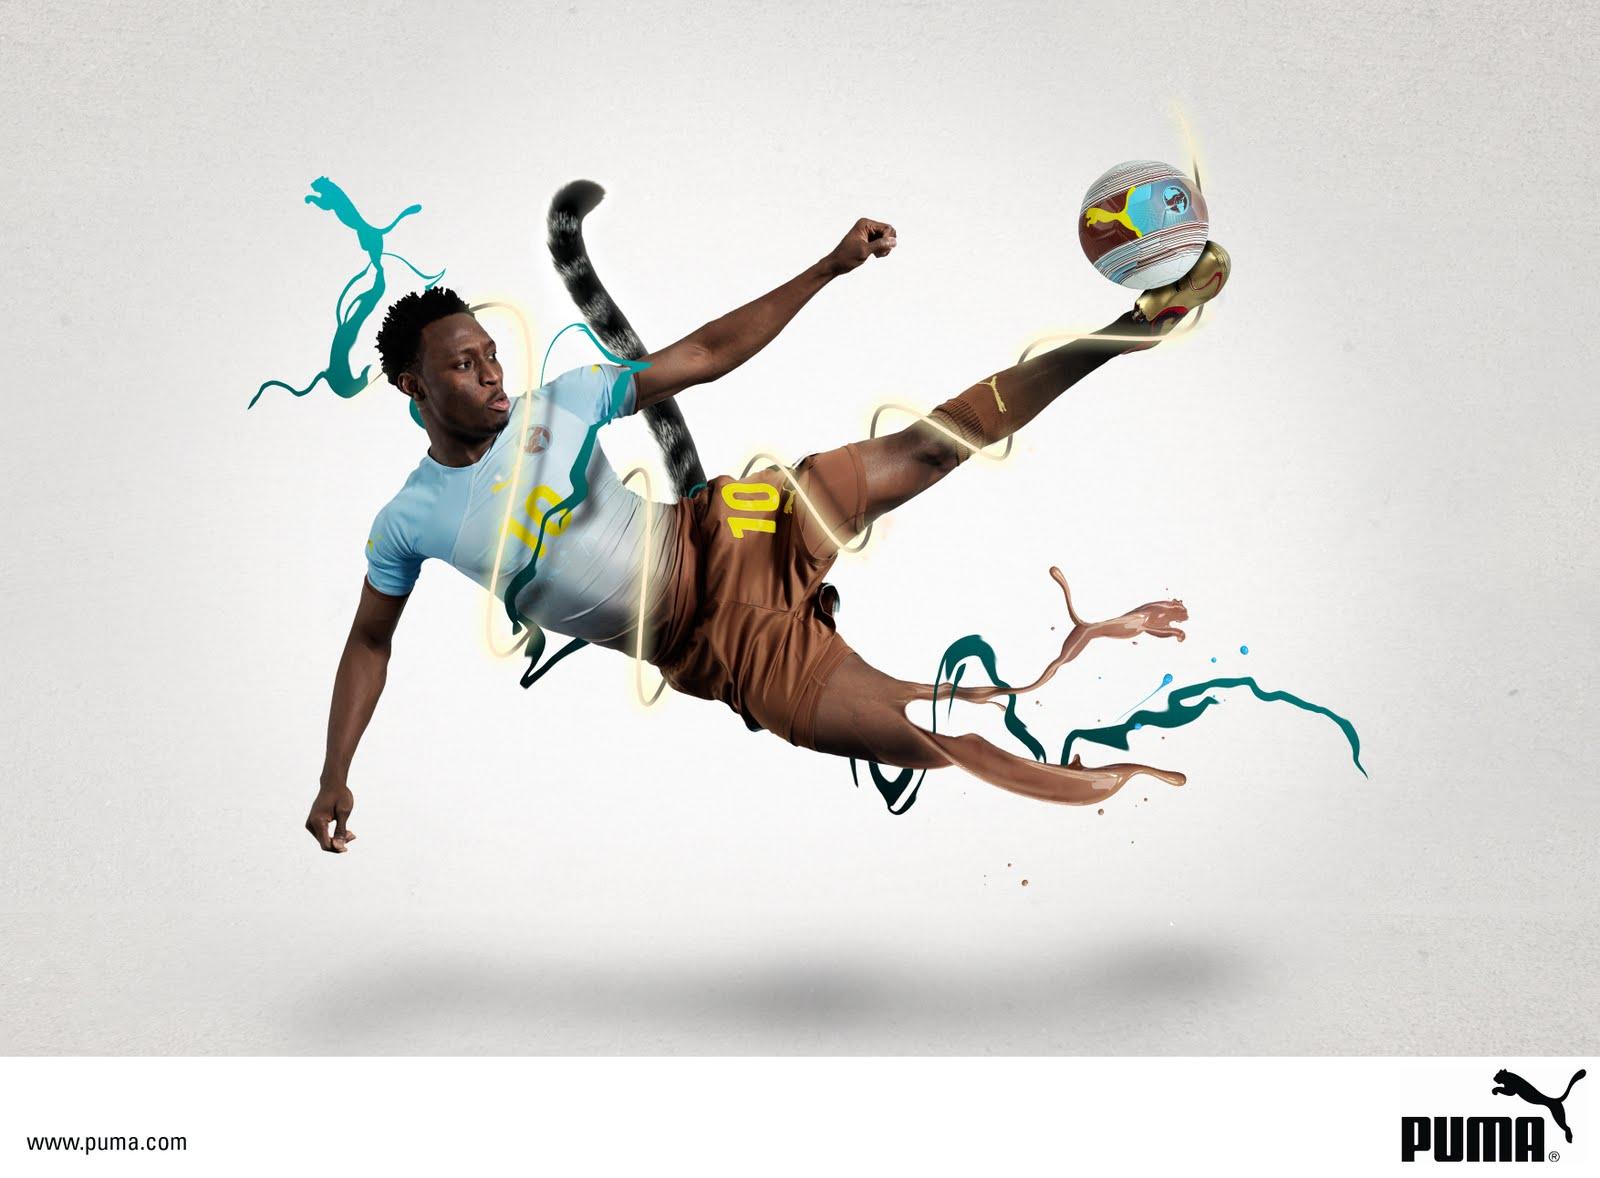 daily beautiful illustrations # 54 : puma sports ads - da ...